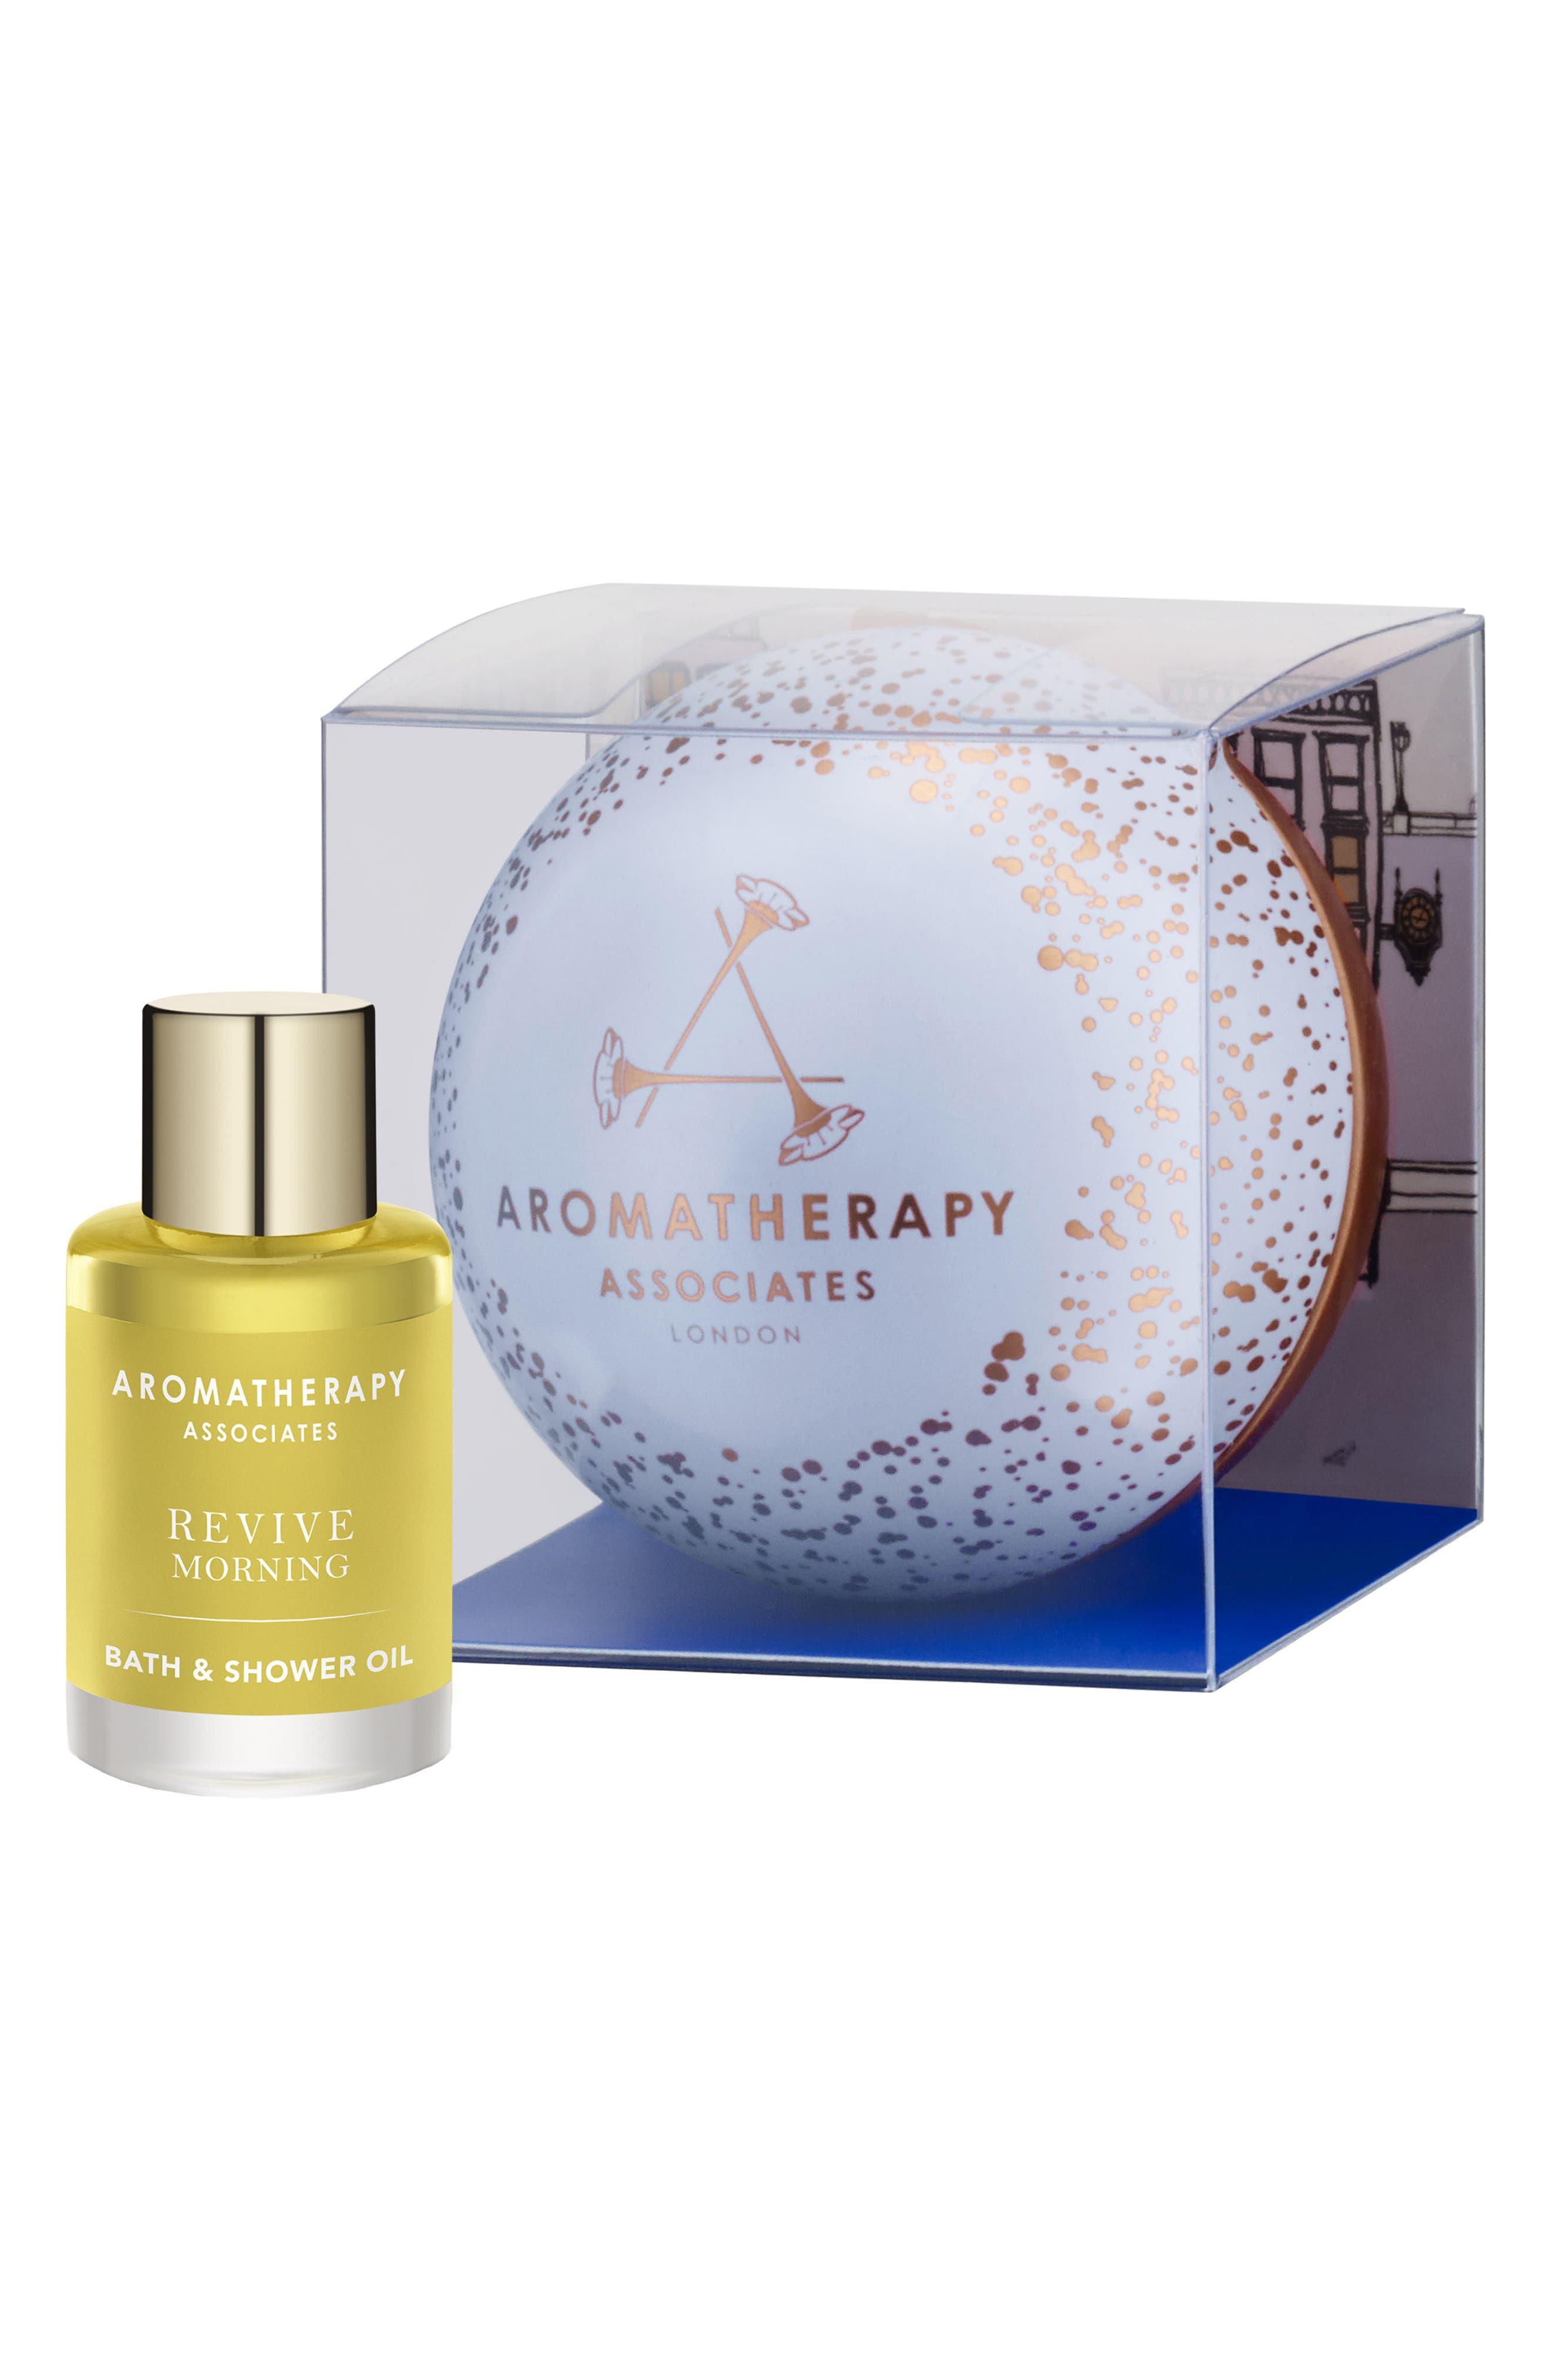 AROMATHERAPY ASSOCIATES Precious Time Bath & Shower Oil in Revive